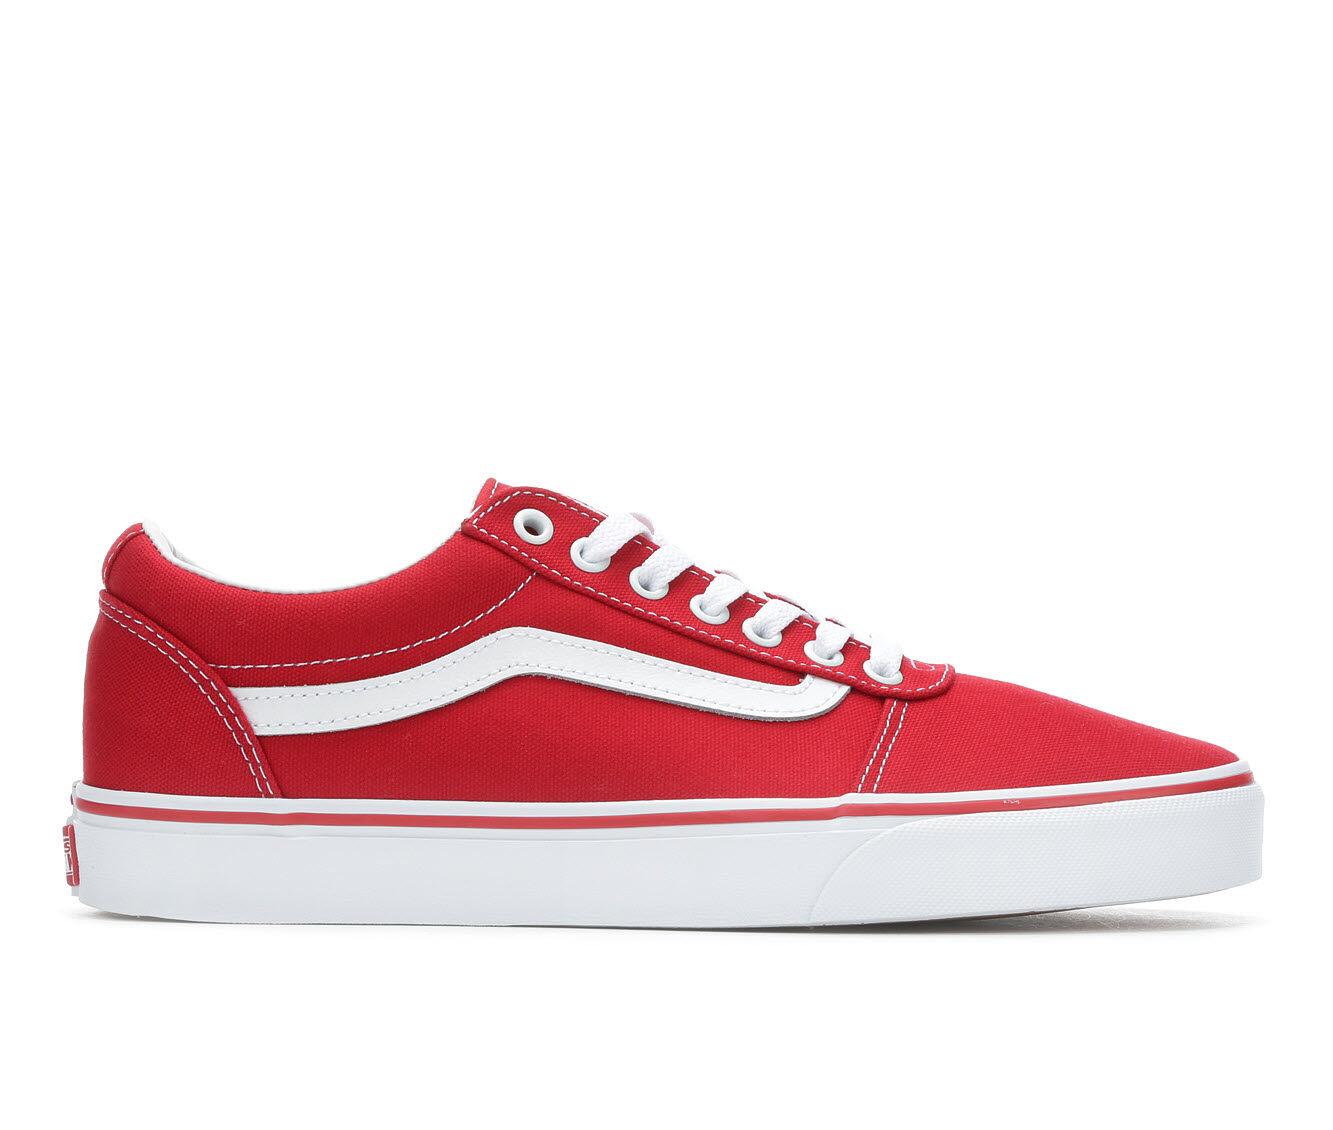 Men's Vans Ward Skate Shoes Racing Red/Whit